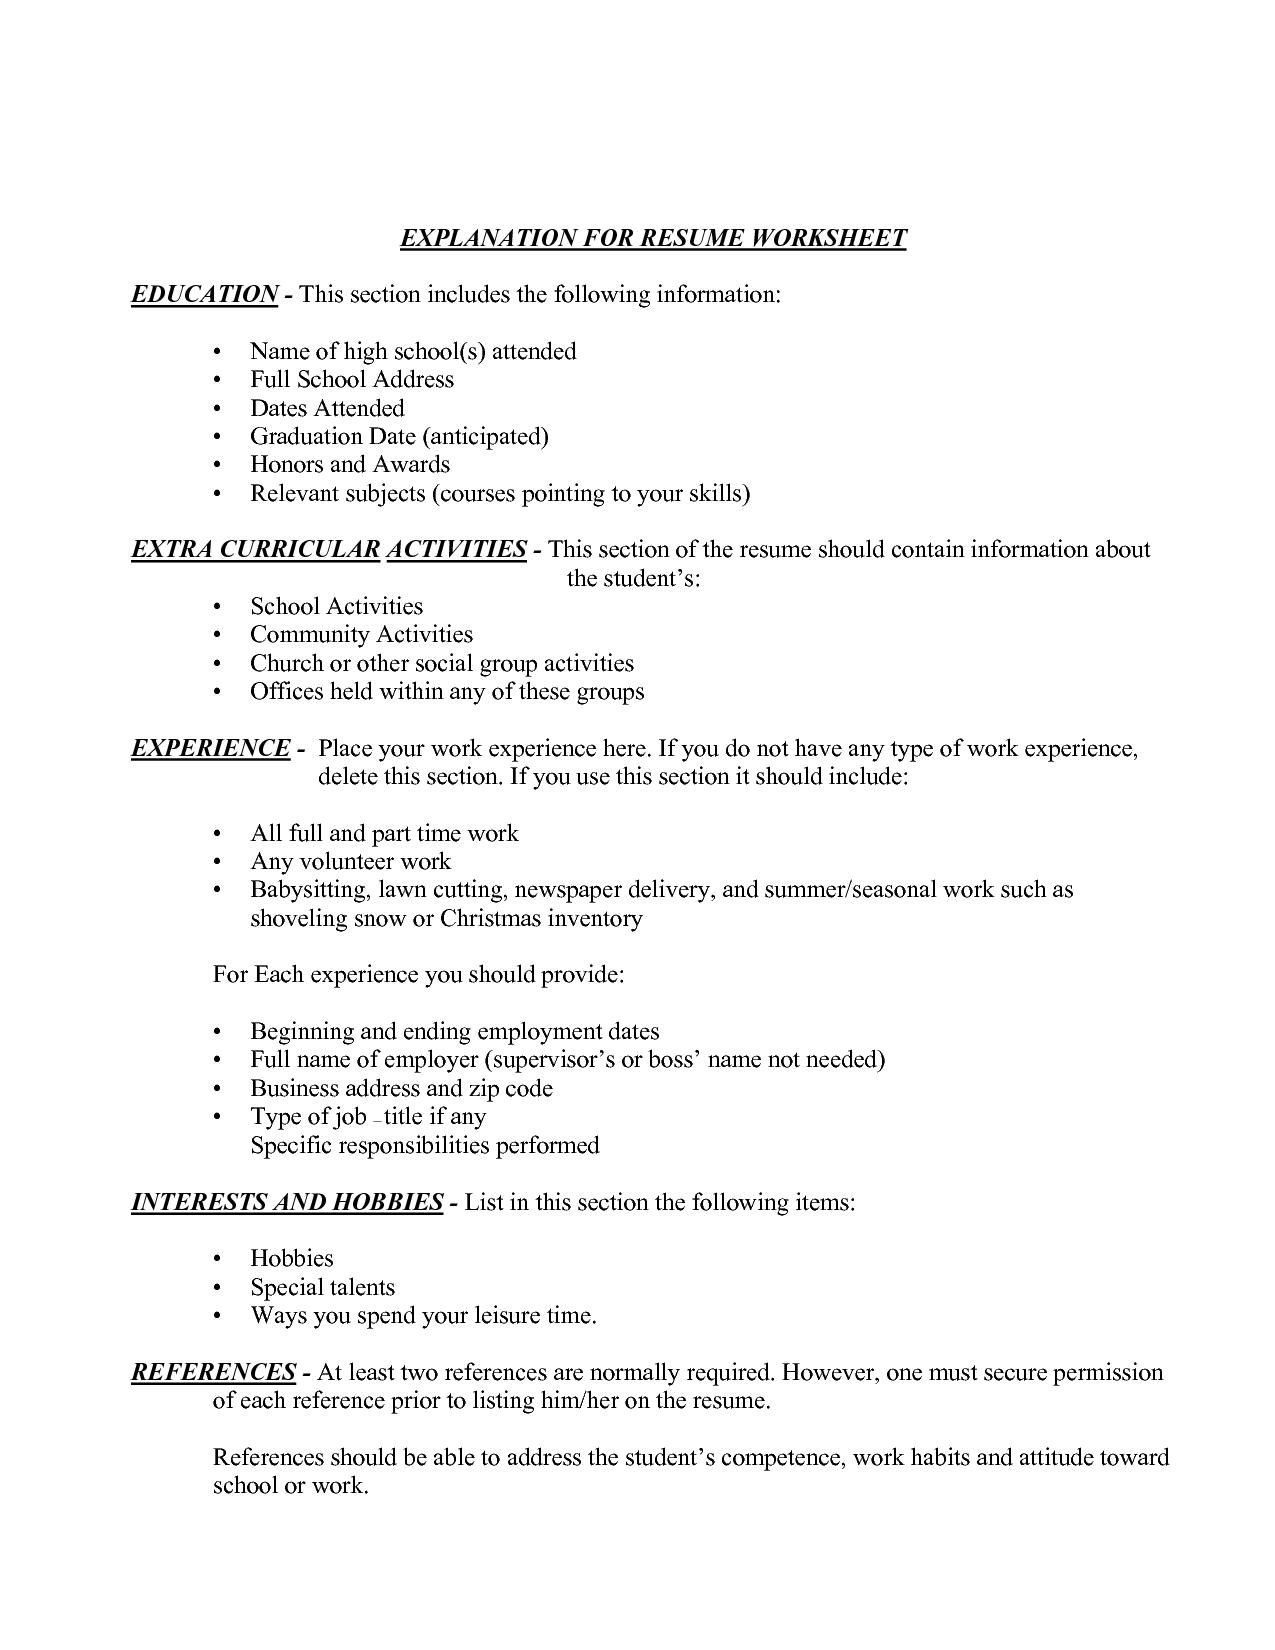 10 Unique Volunteer Ideas For Highschool Students brilliant ideas of resume education examples for highschool students 2020